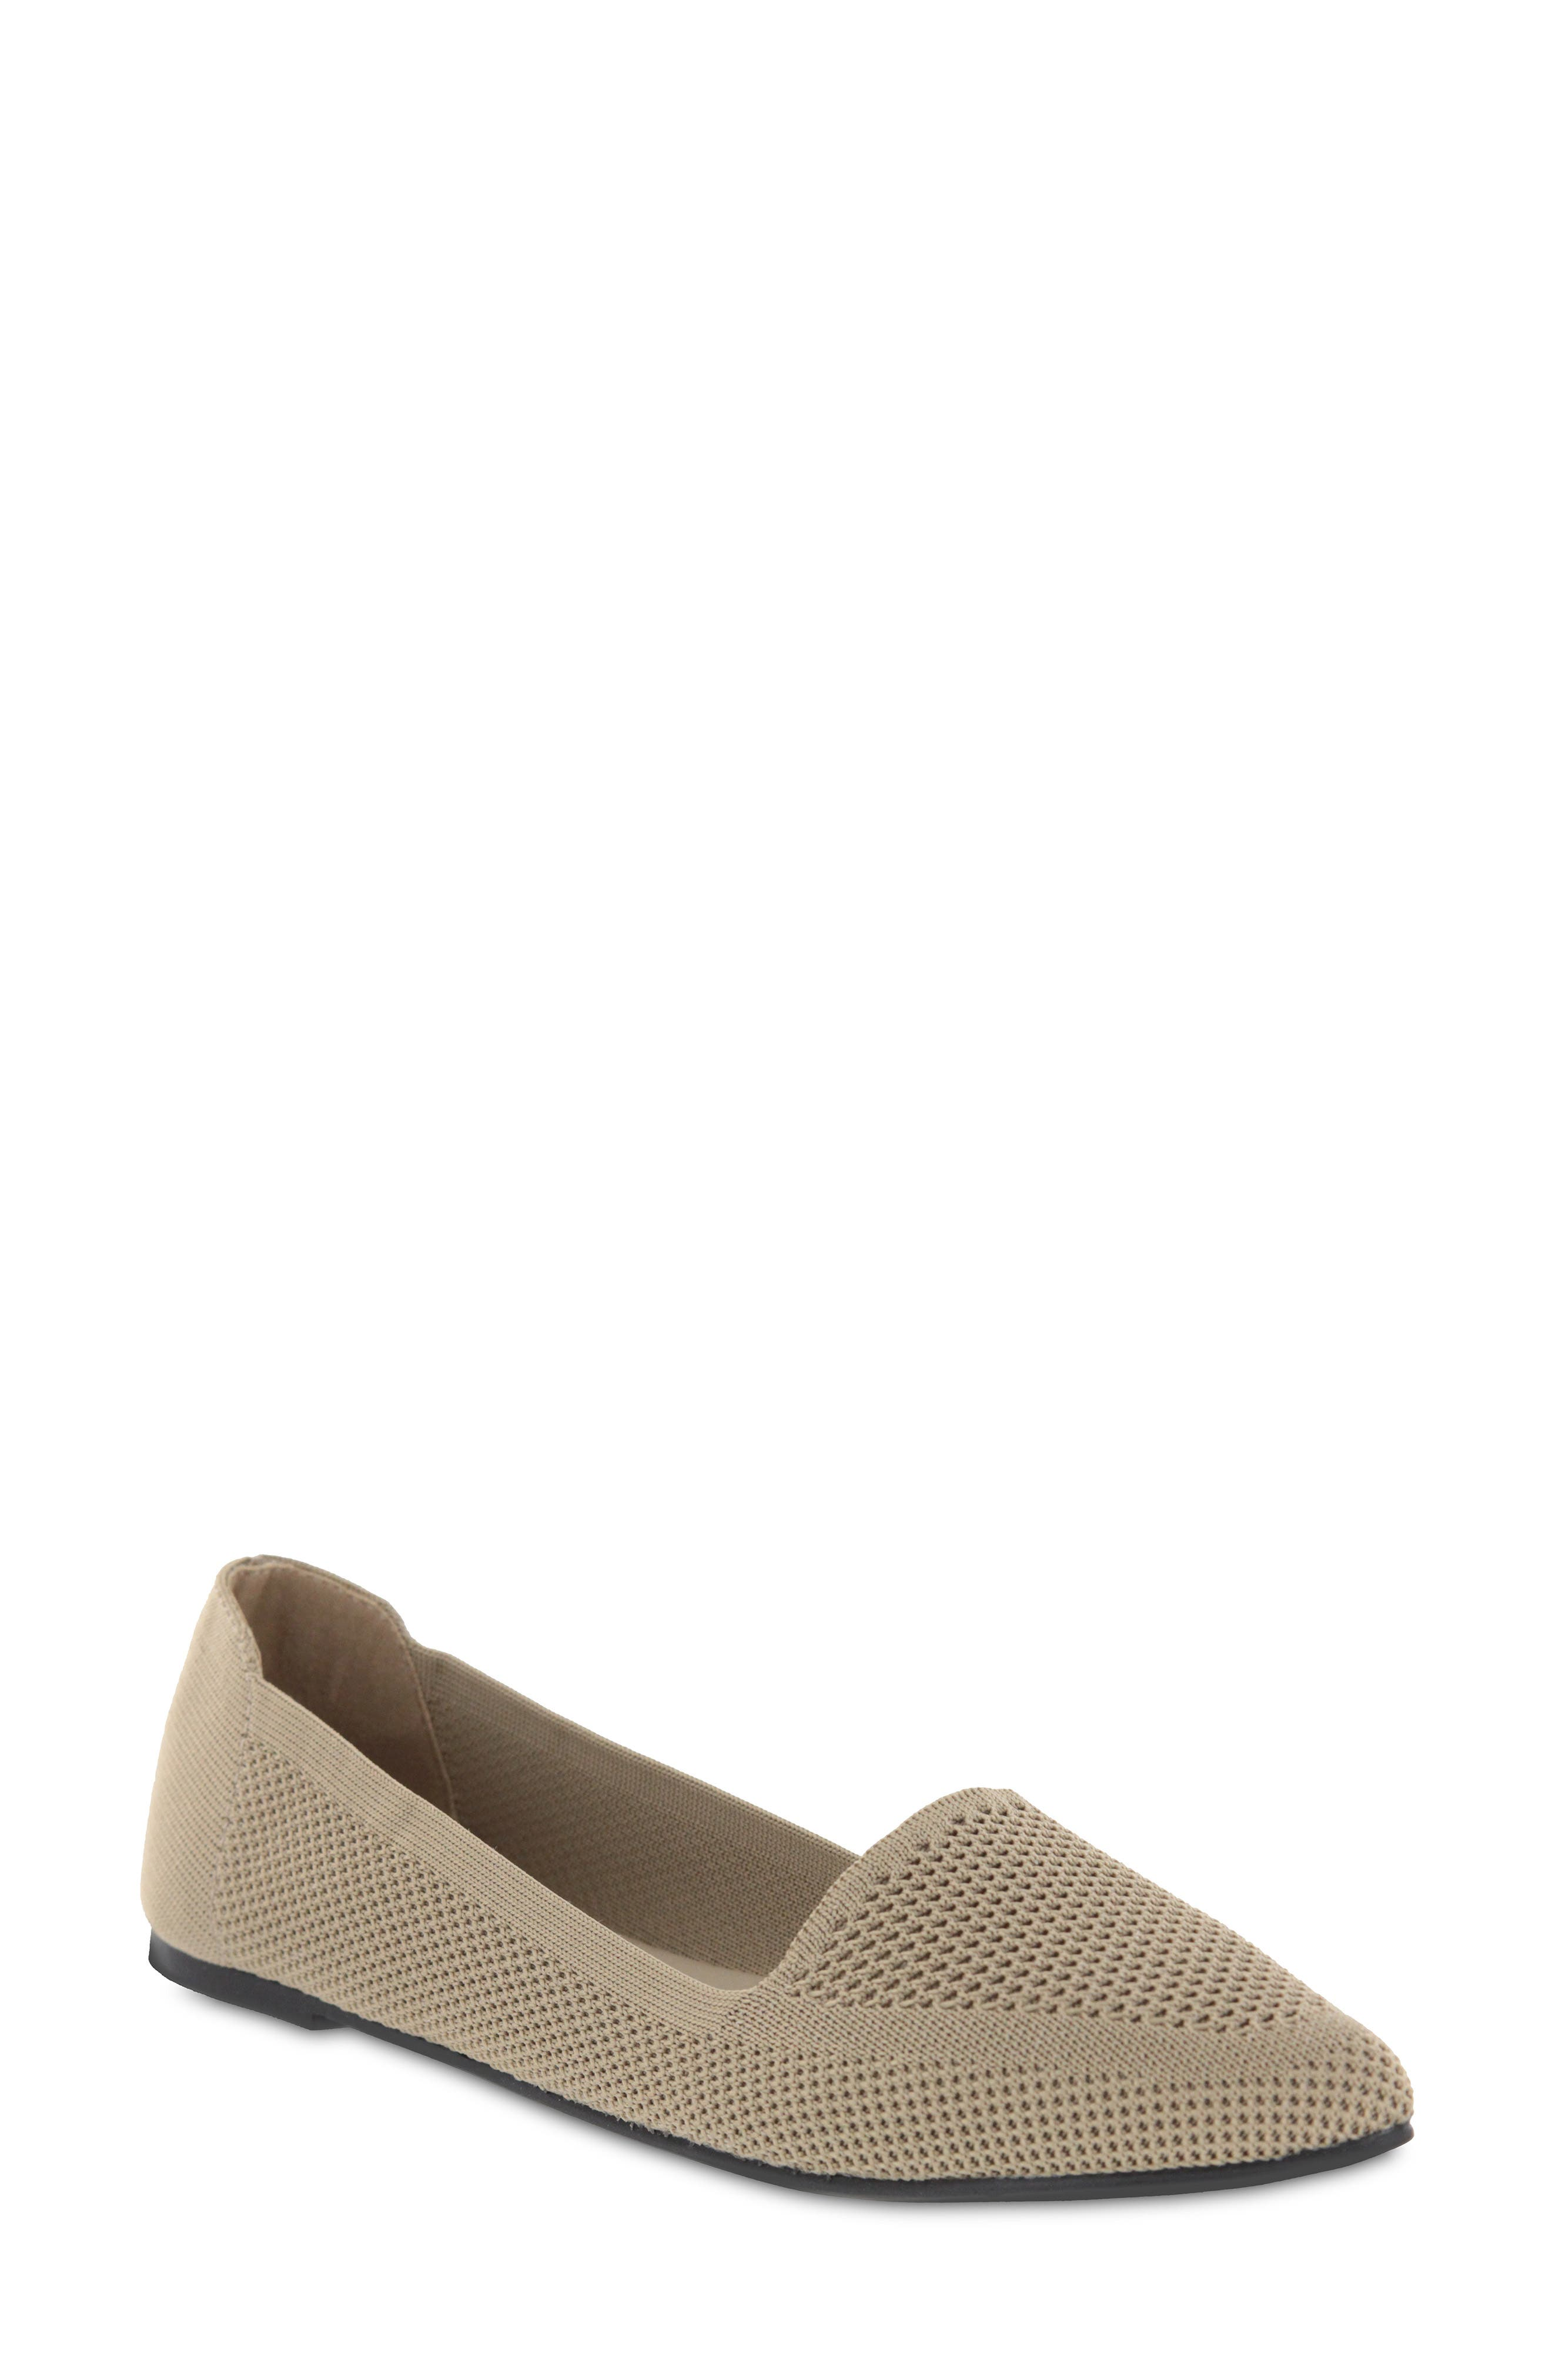 Corrine Knit Flat